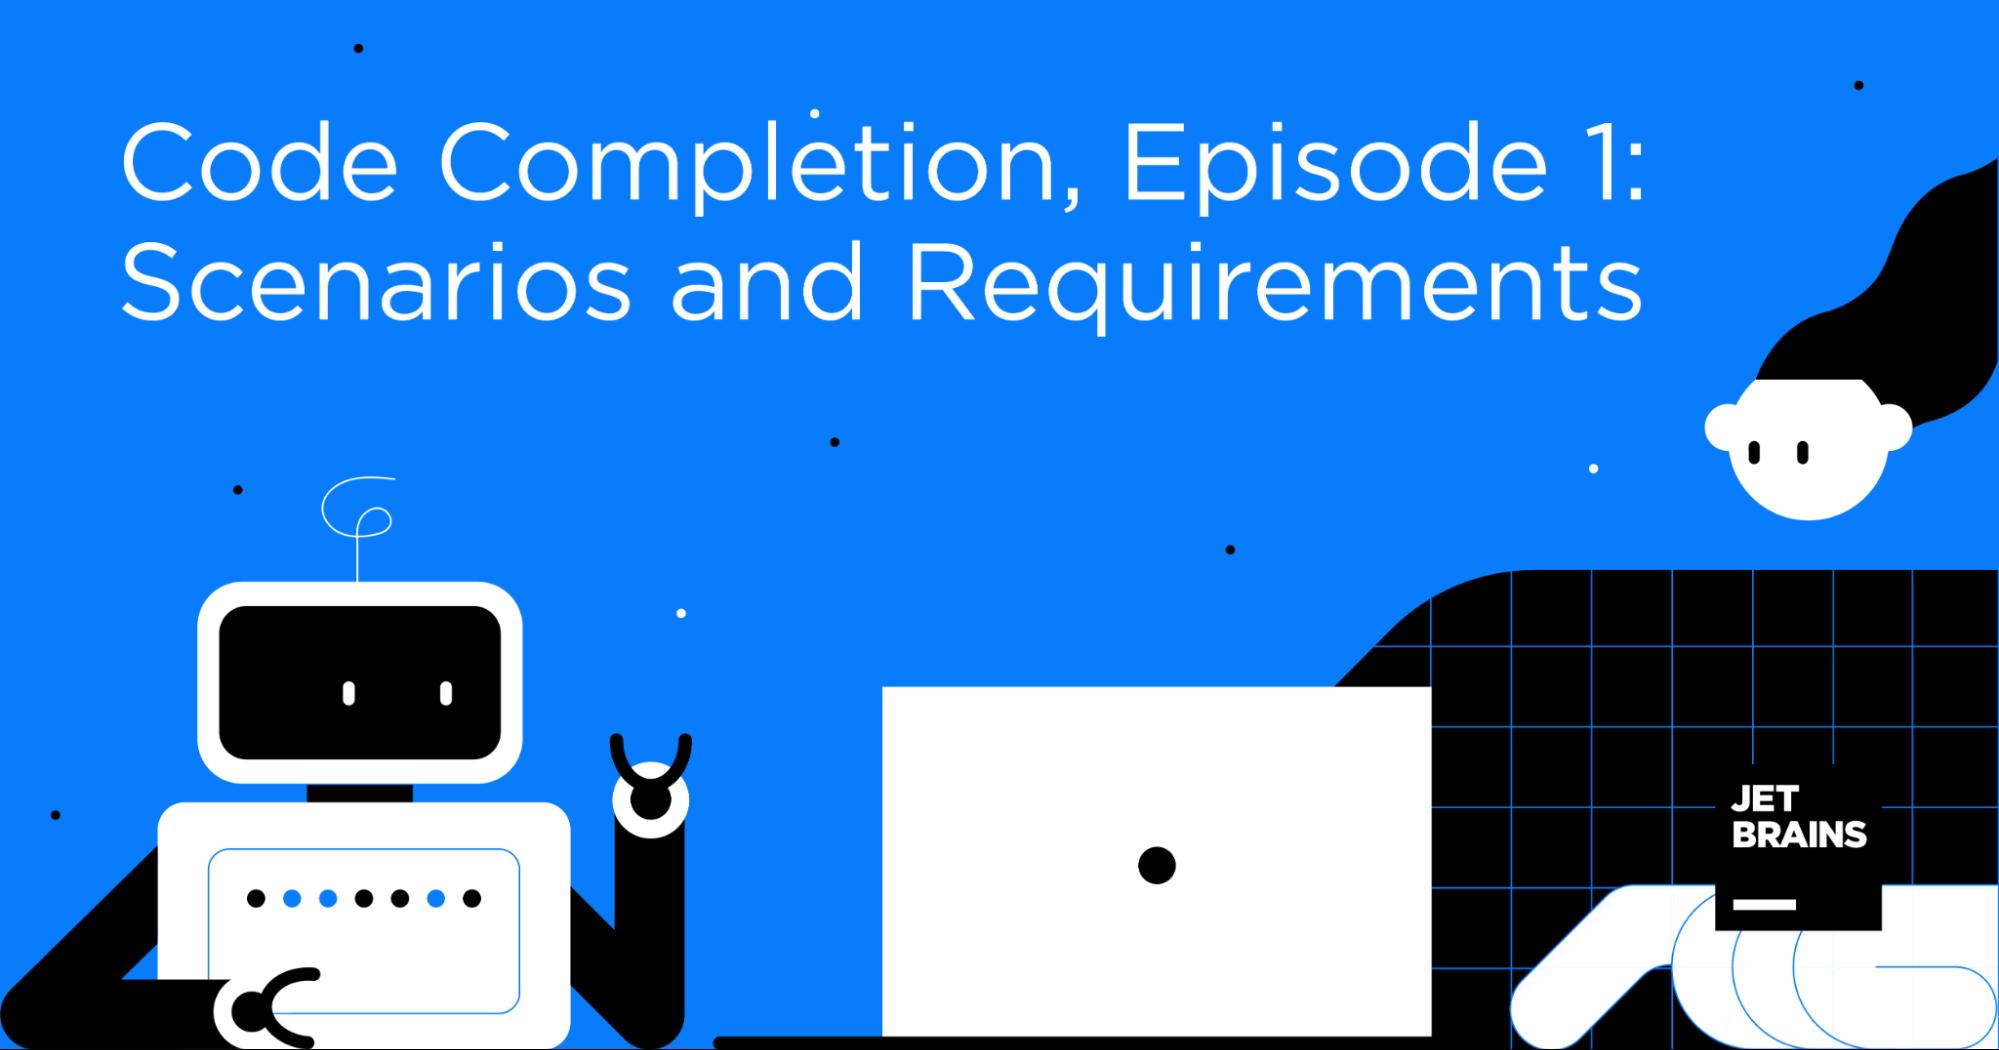 Code Completion, Episode 1: Scenarios and Requirements